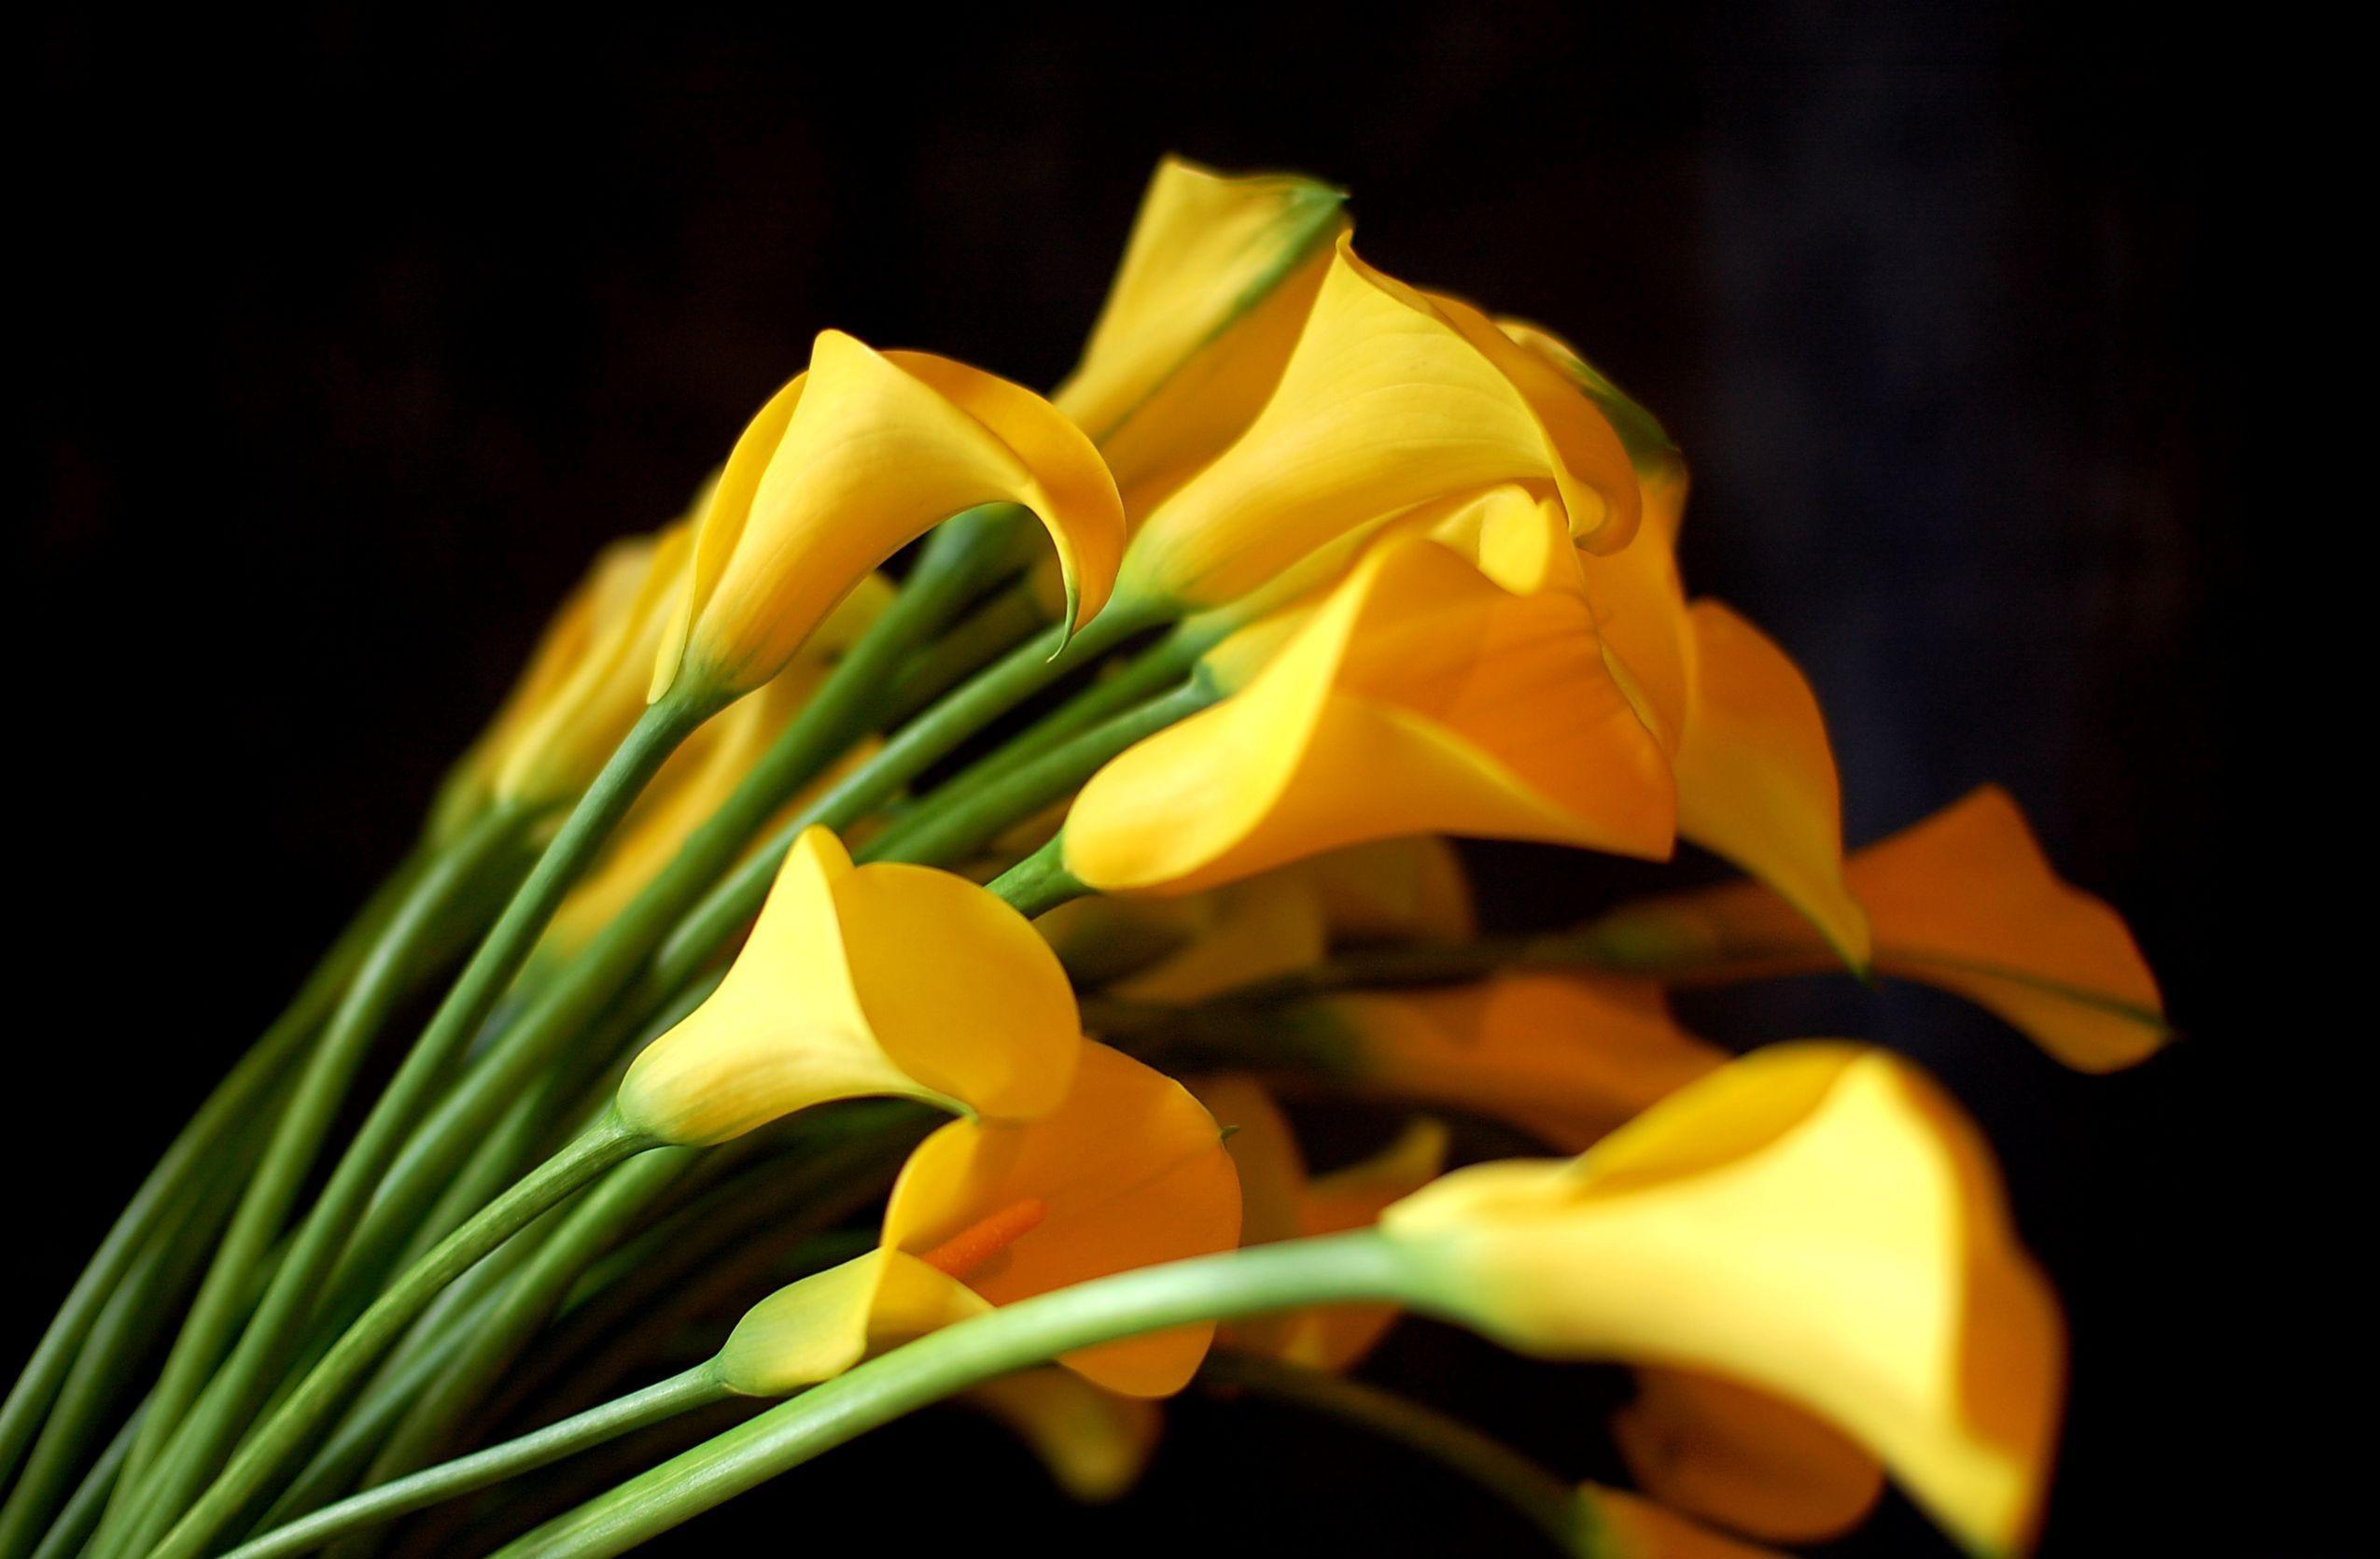 Wallpaper calla lilies flowers yellow bouquet black background calla lilies flowers yellow bouquet black background sharpness izmirmasajfo